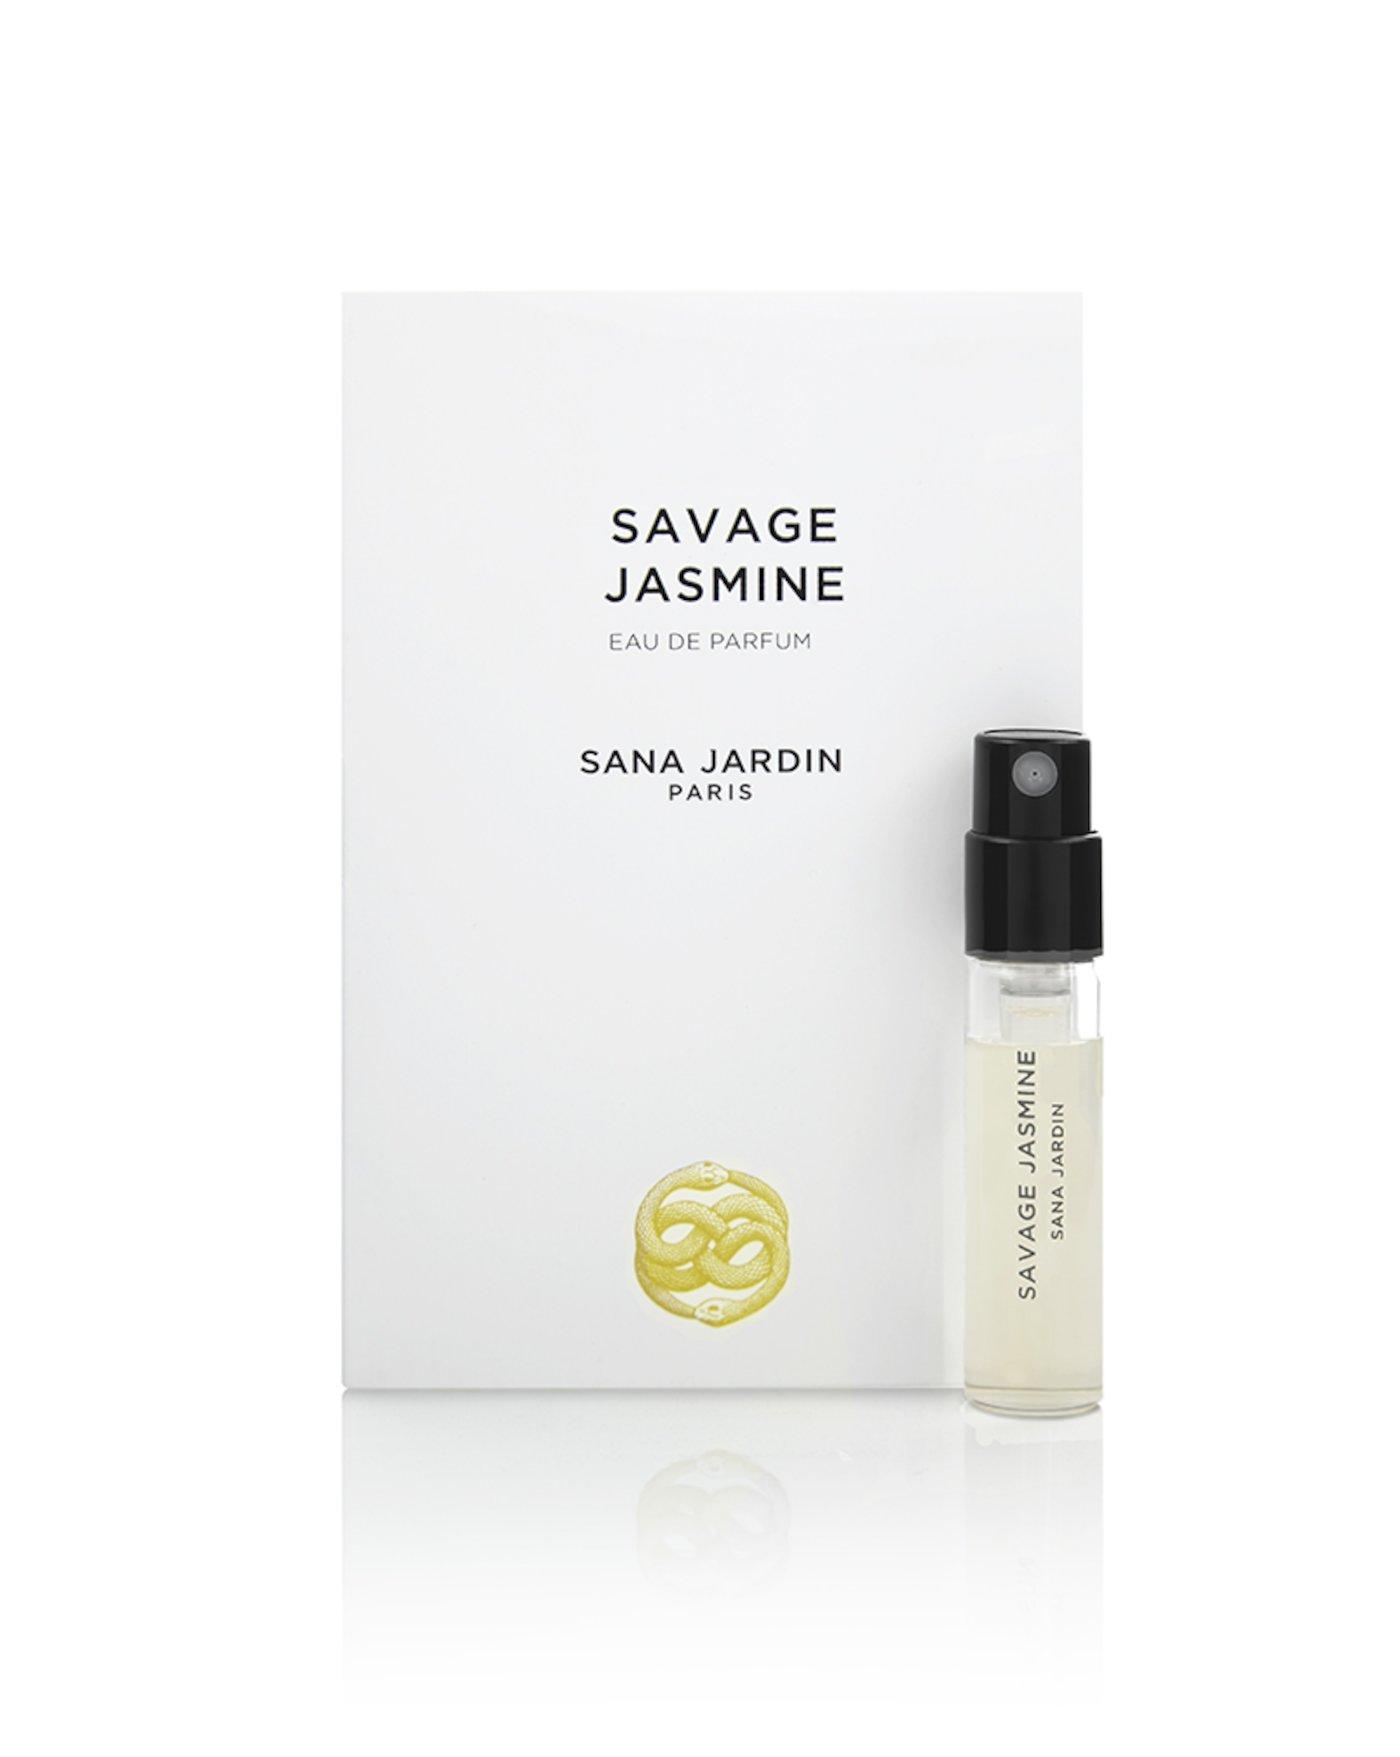 Savage Jasmine 2ml in card